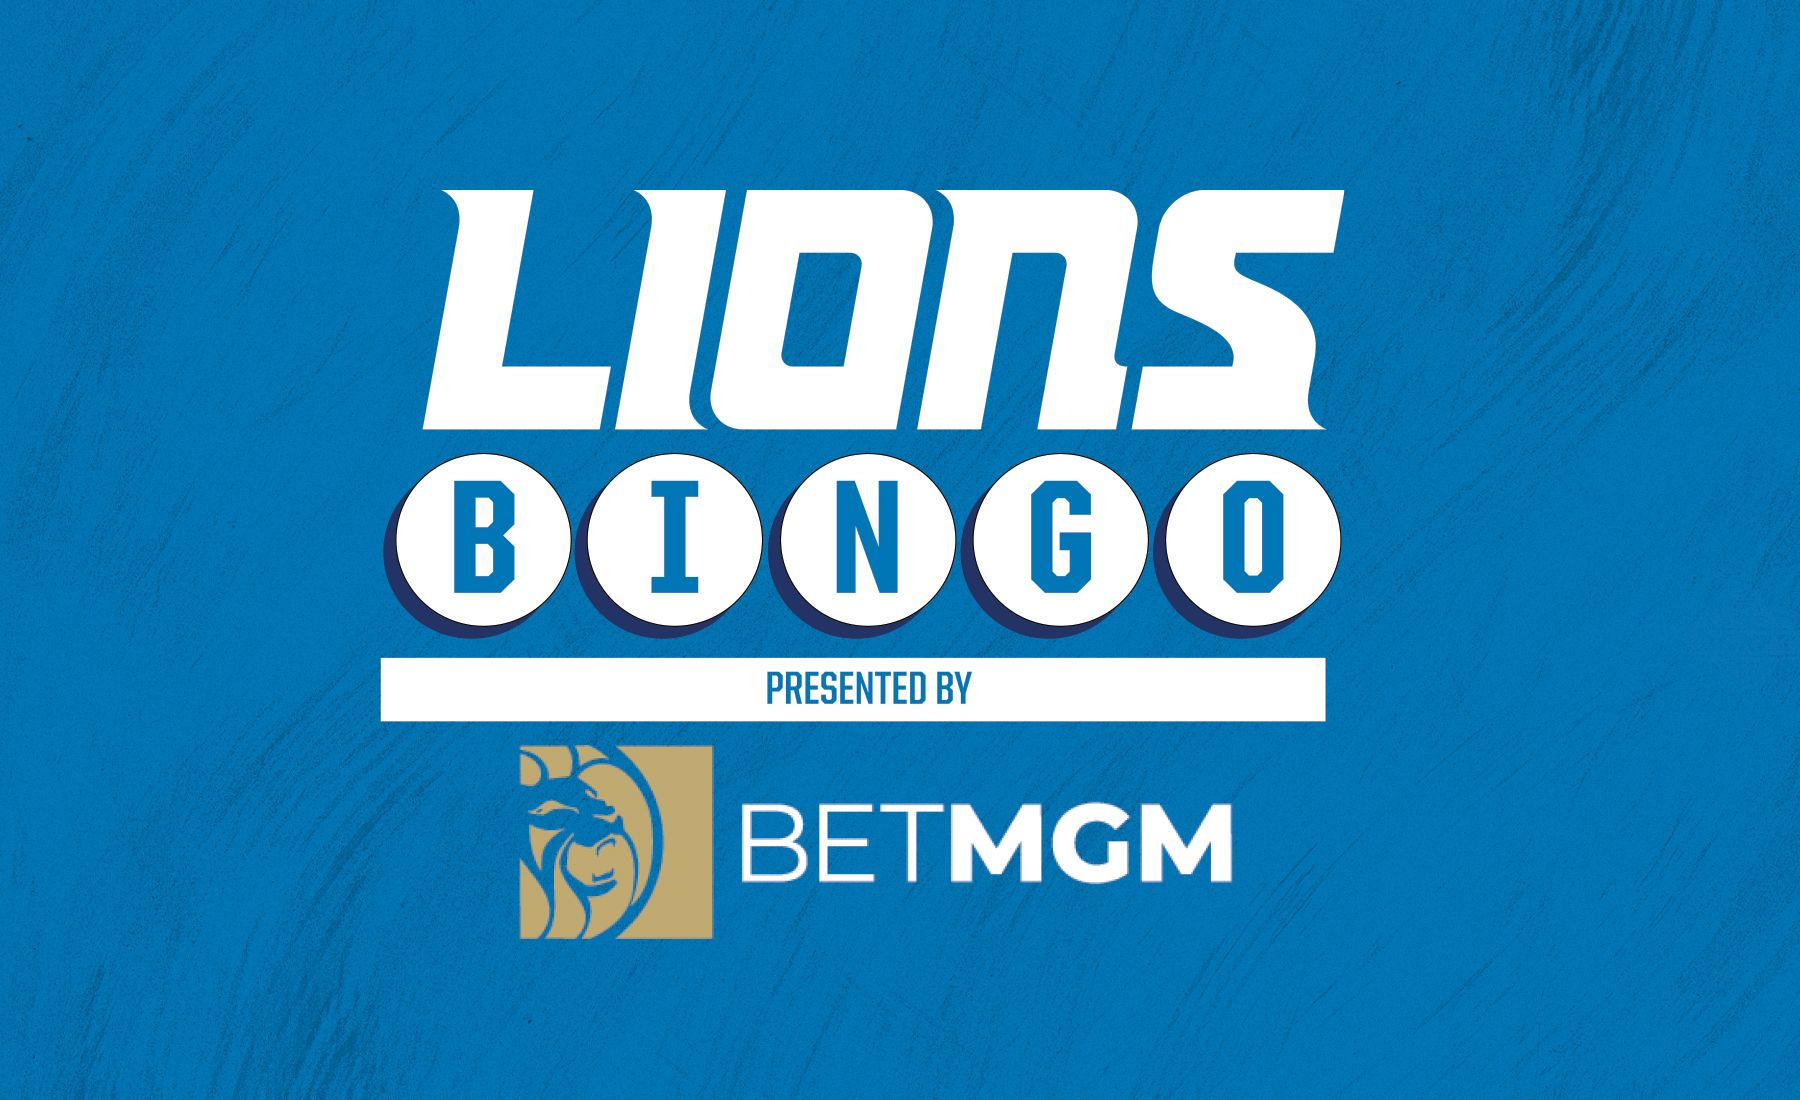 lions-bingo-tile